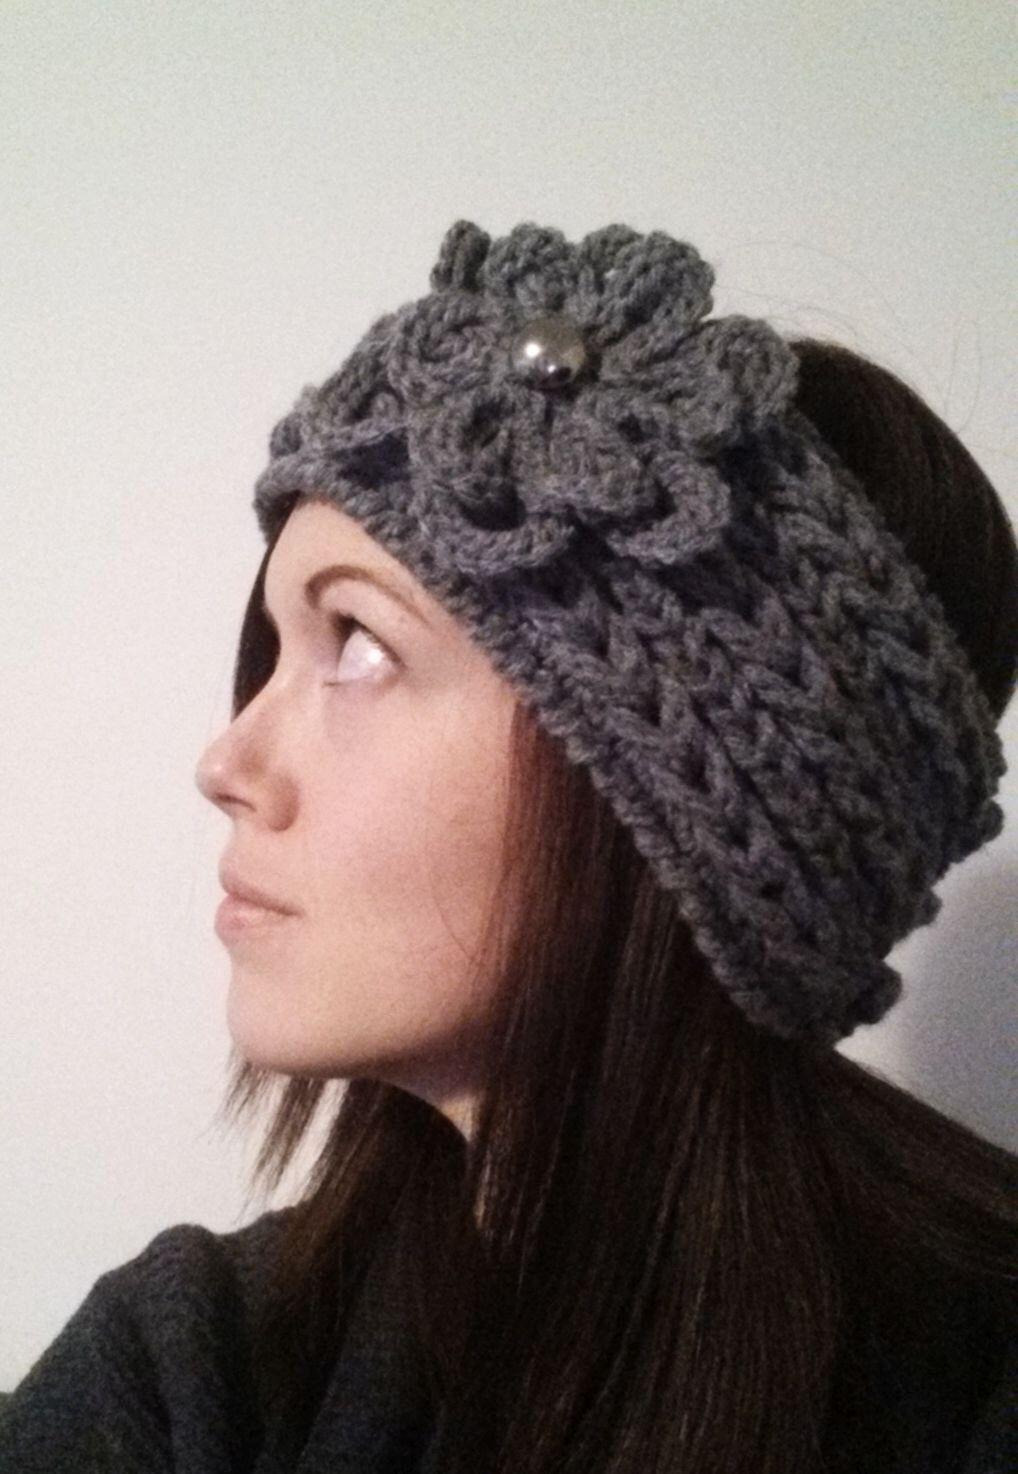 Winter Weave Crochet Headband Pattern Textured Braided Flower ...